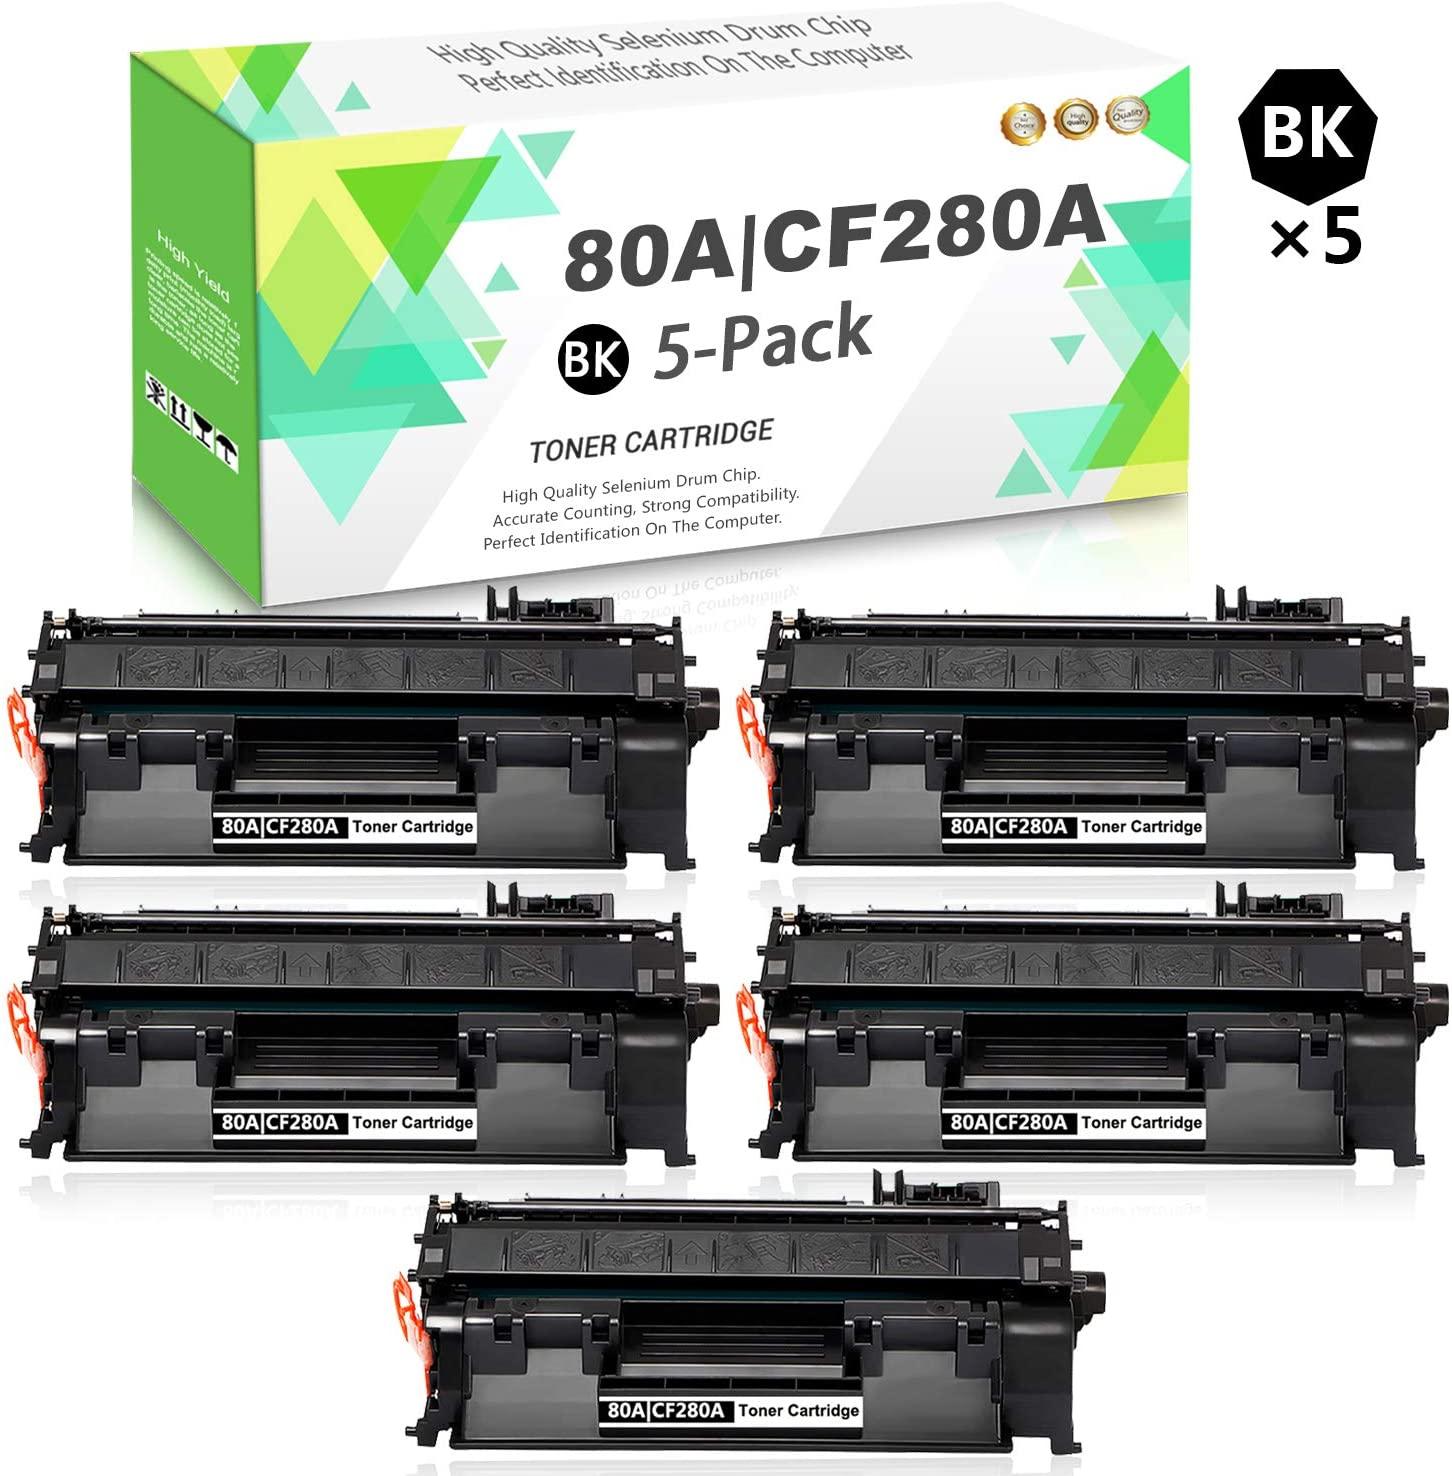 Compatible 80A   CF280A Toner Cartridge (Black,5-Pack) Replacement for HP Laserjet Pro 400 M401dn M401dne M401dw M401n MFP M425dn Series Printers,Sold by TmallToner.